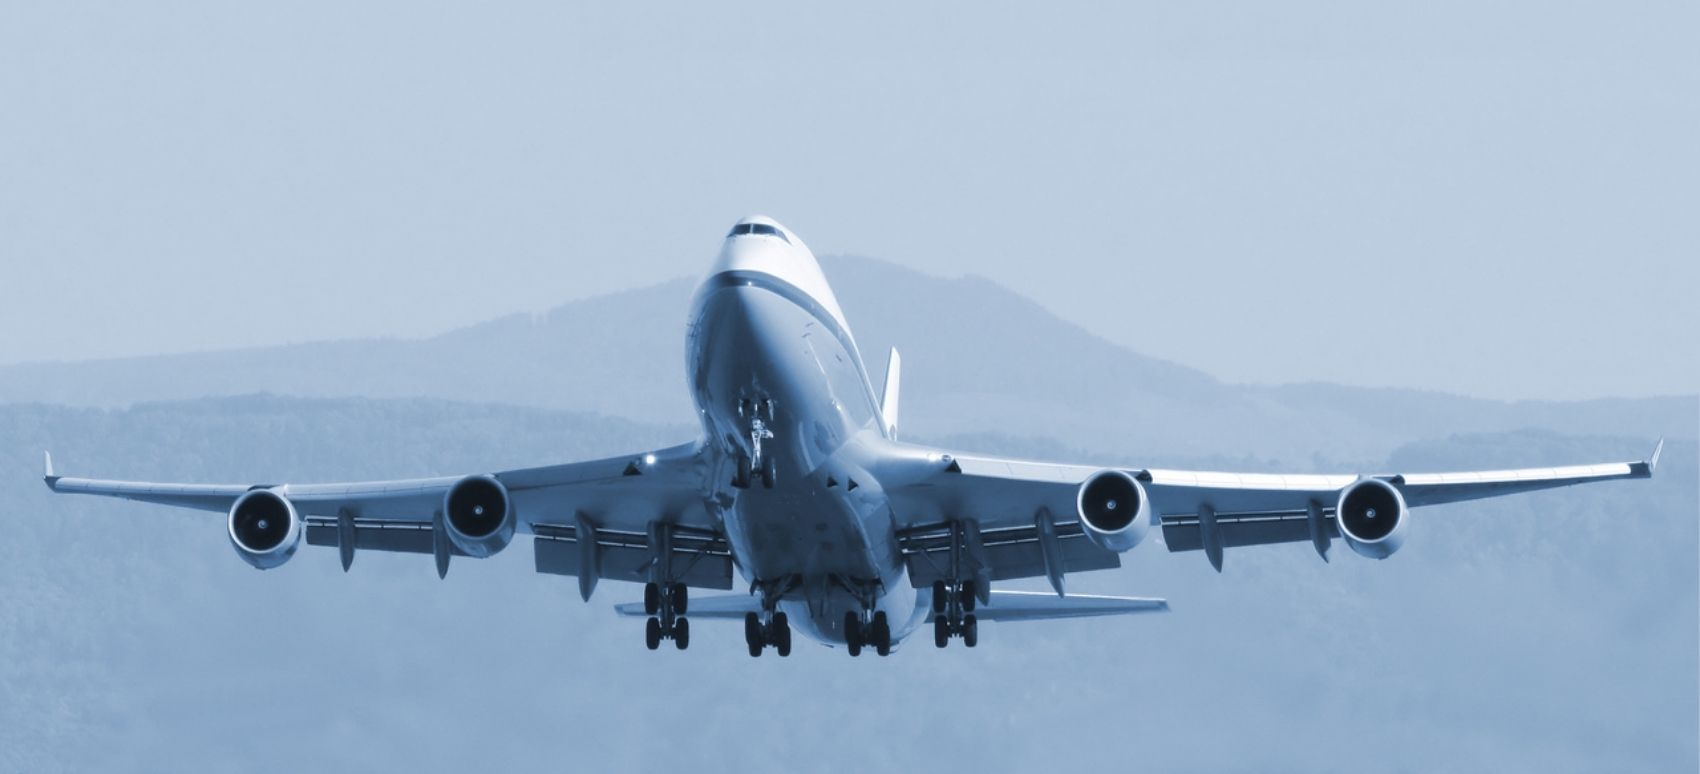 Red de vuelos chárter   DSV